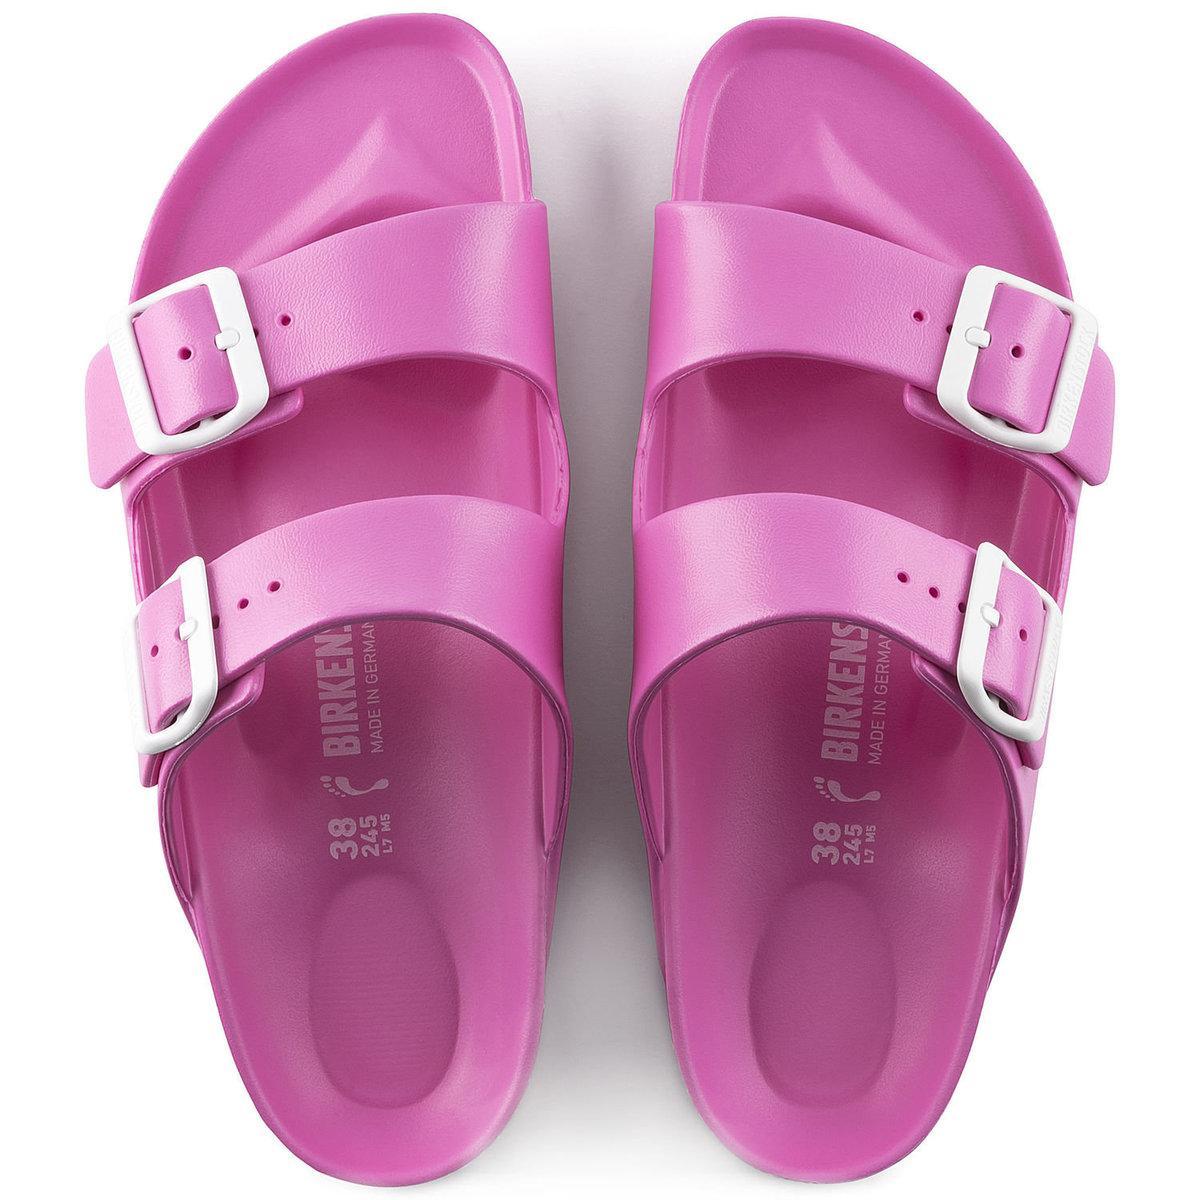 557264258dea Birkenstock - Pink Arizona Essentials Eva Sandal - Lyst. View fullscreen